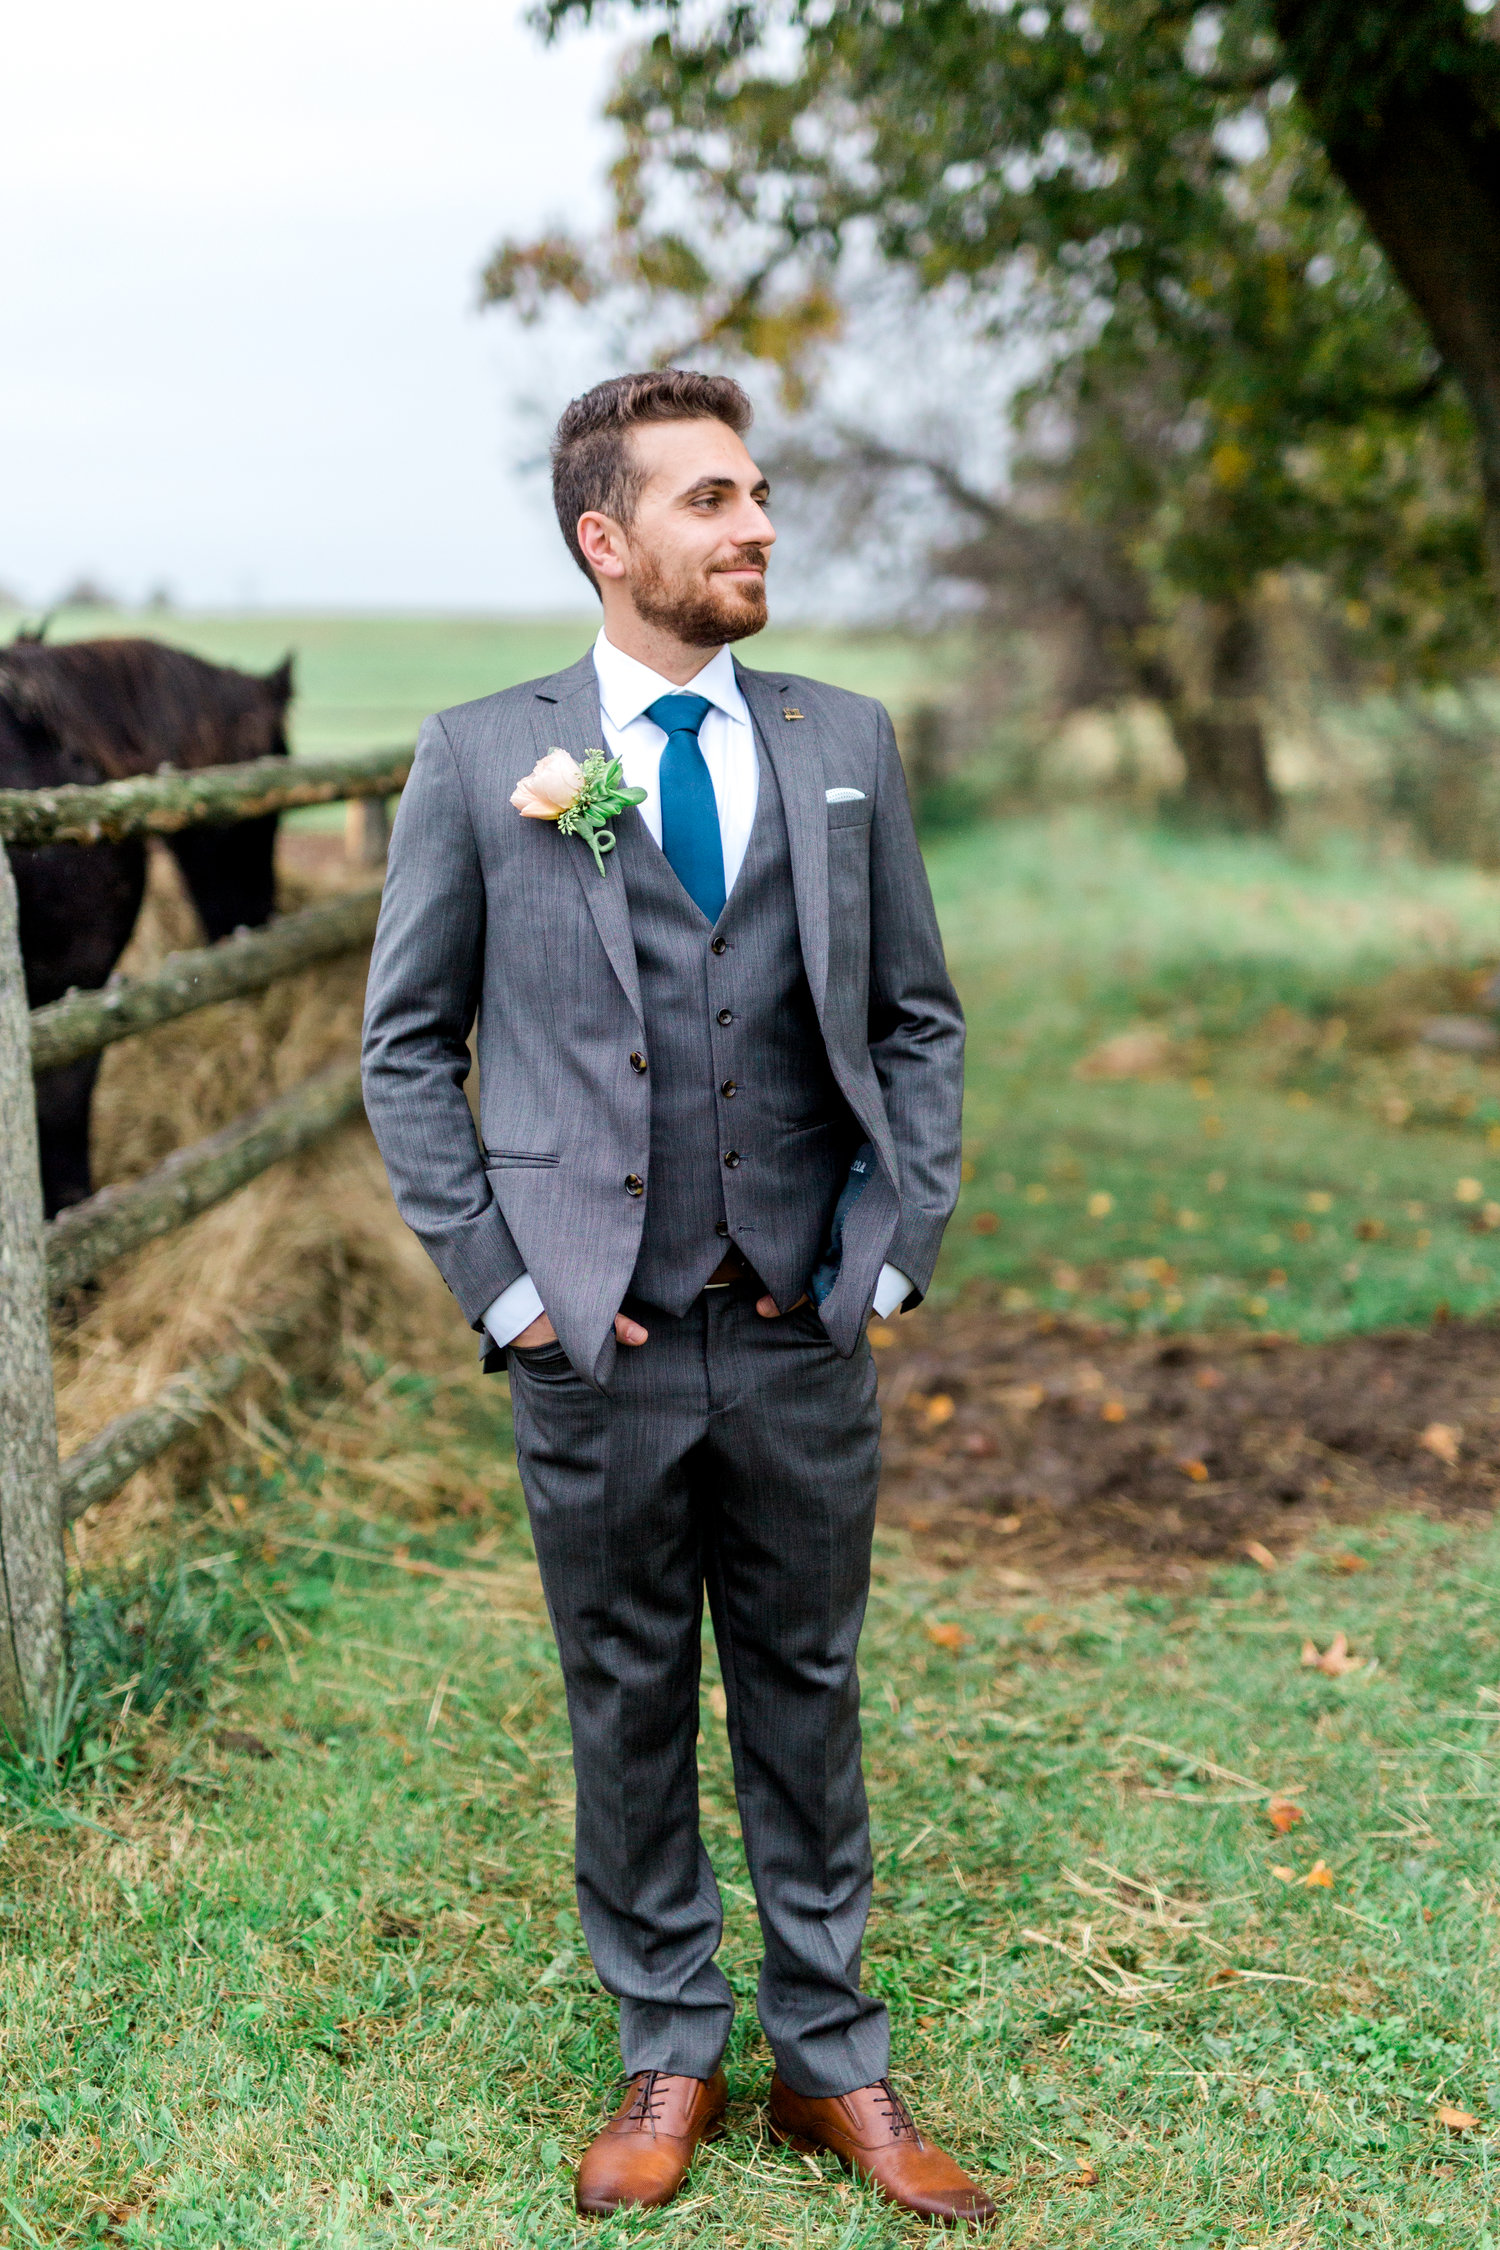 Amir-Golbazi-Danielle-Giroux-Photography_Toronto-Wedding_Cedarwood_Rachel-Paul_548.jpg